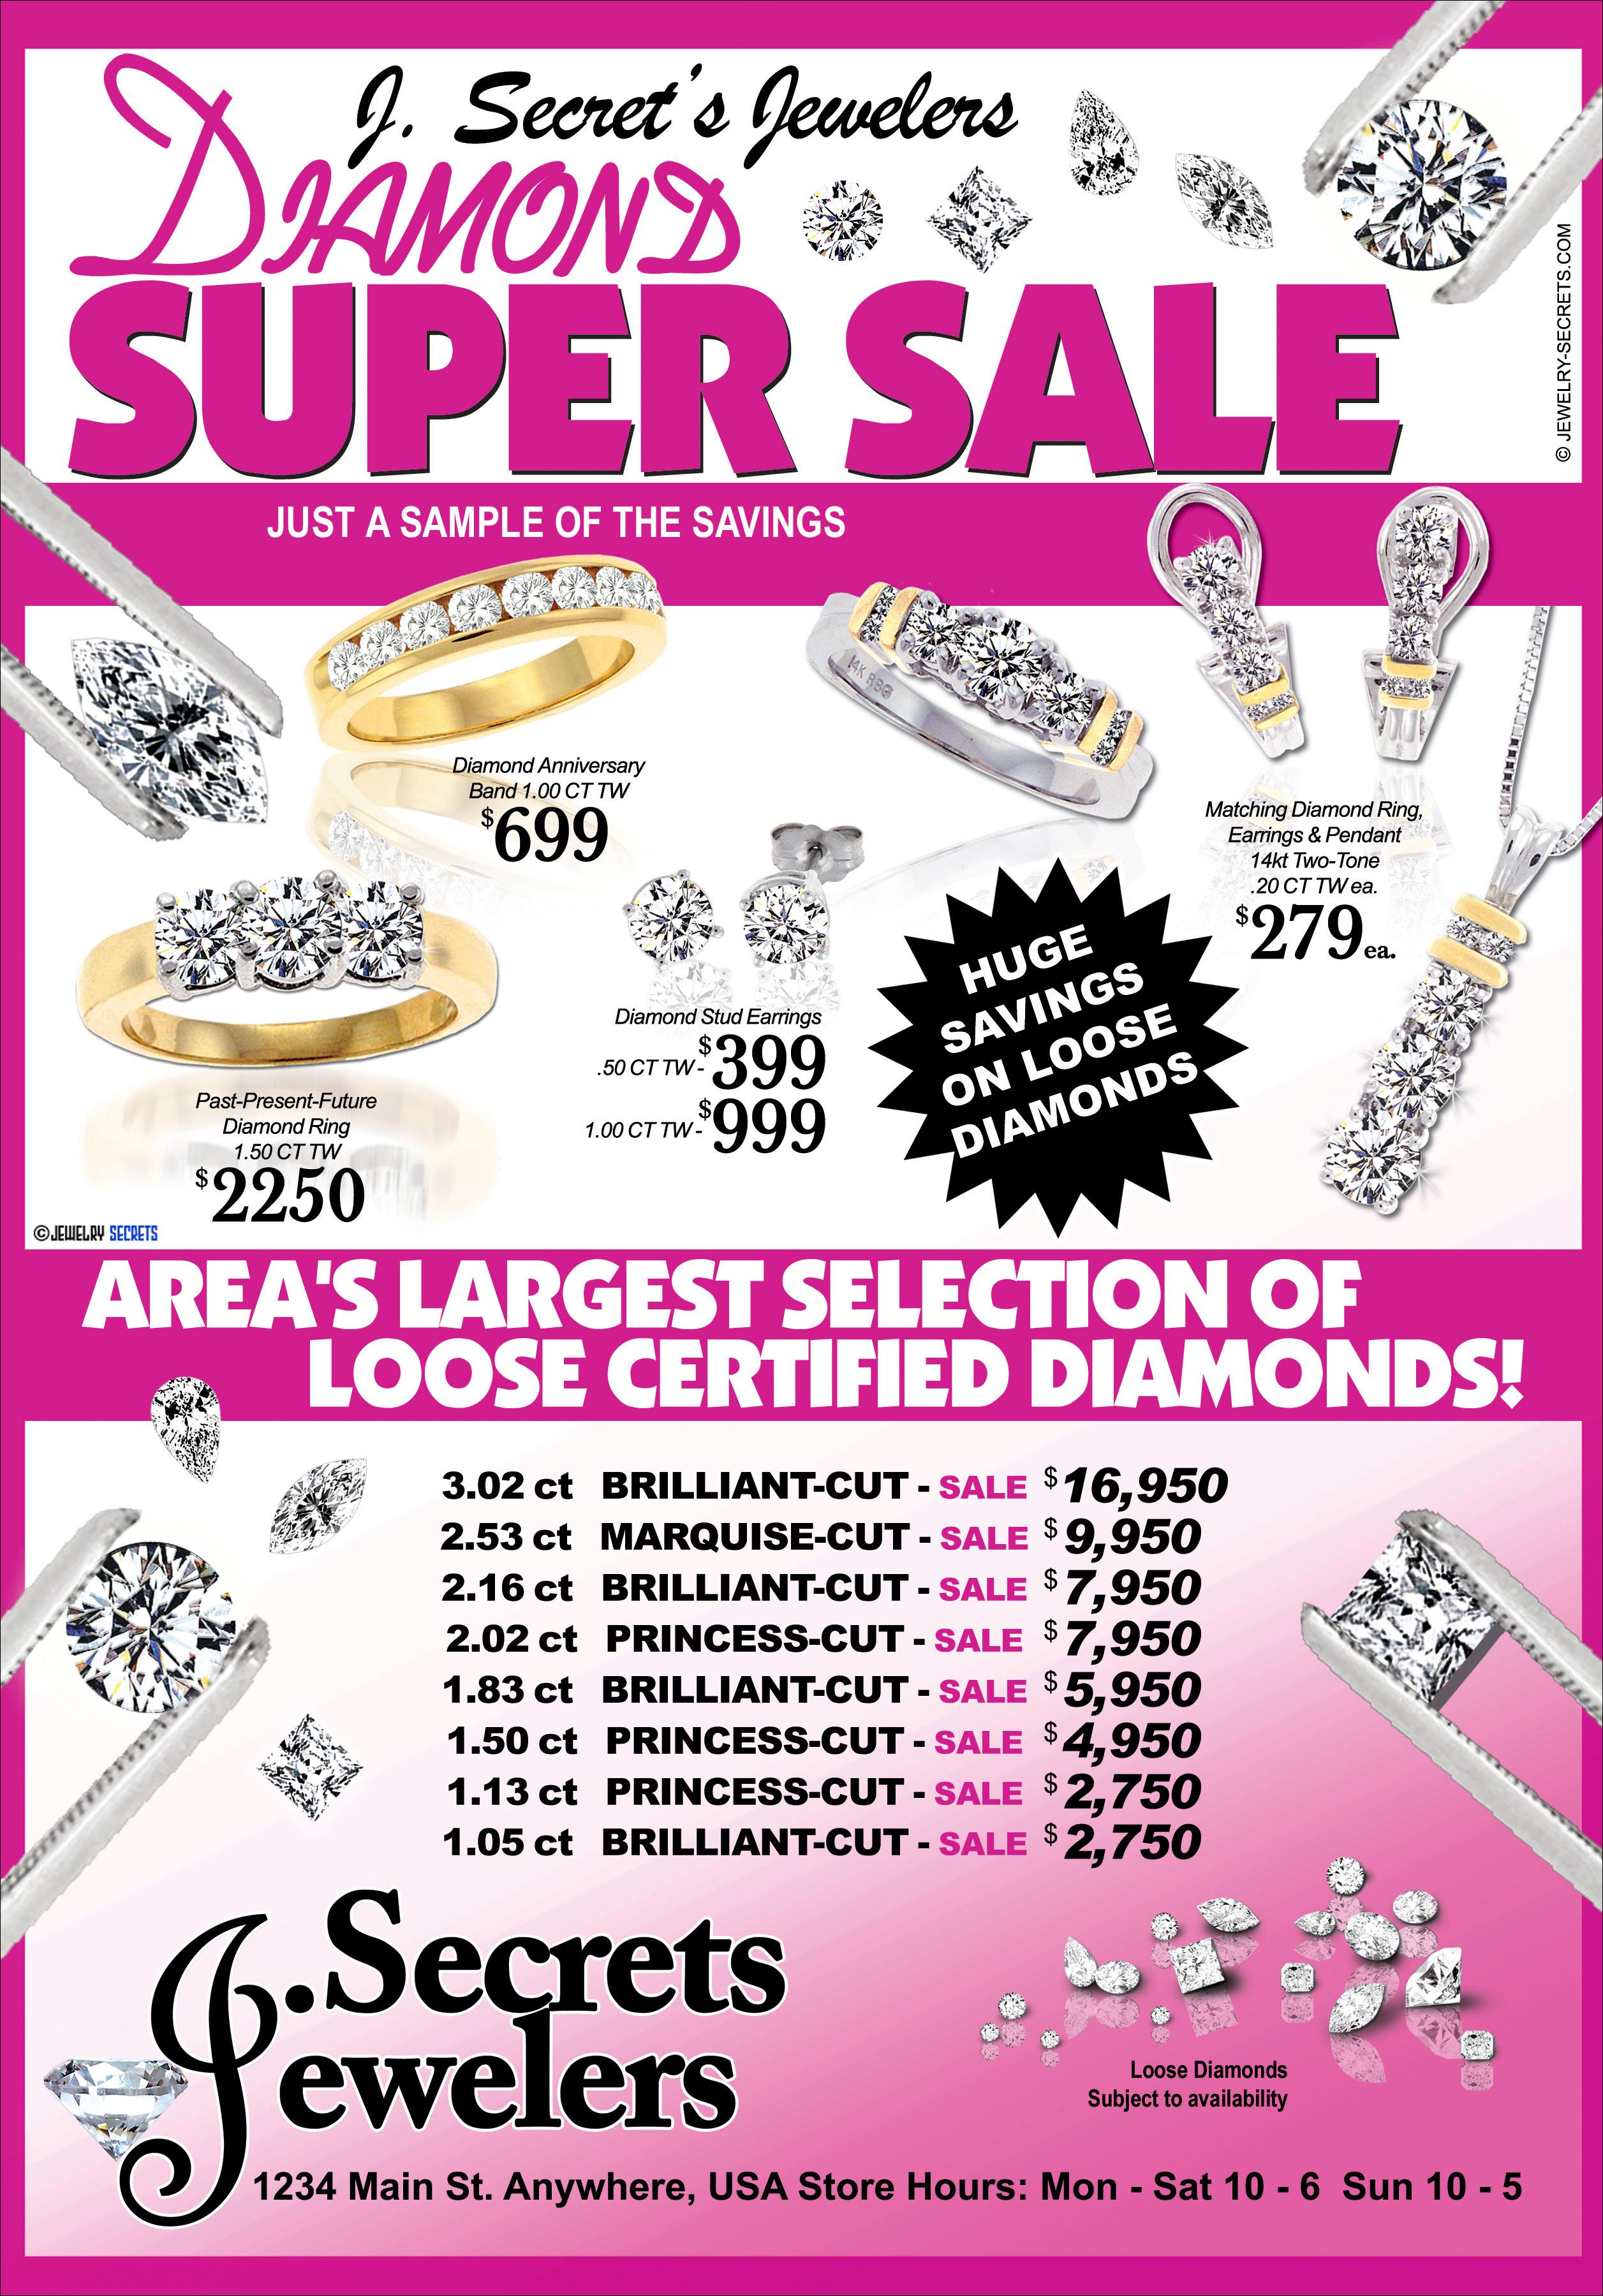 DIAMOND SUPER SALE SAMPLE ADVERTISEMENT – Jewelry Secrets